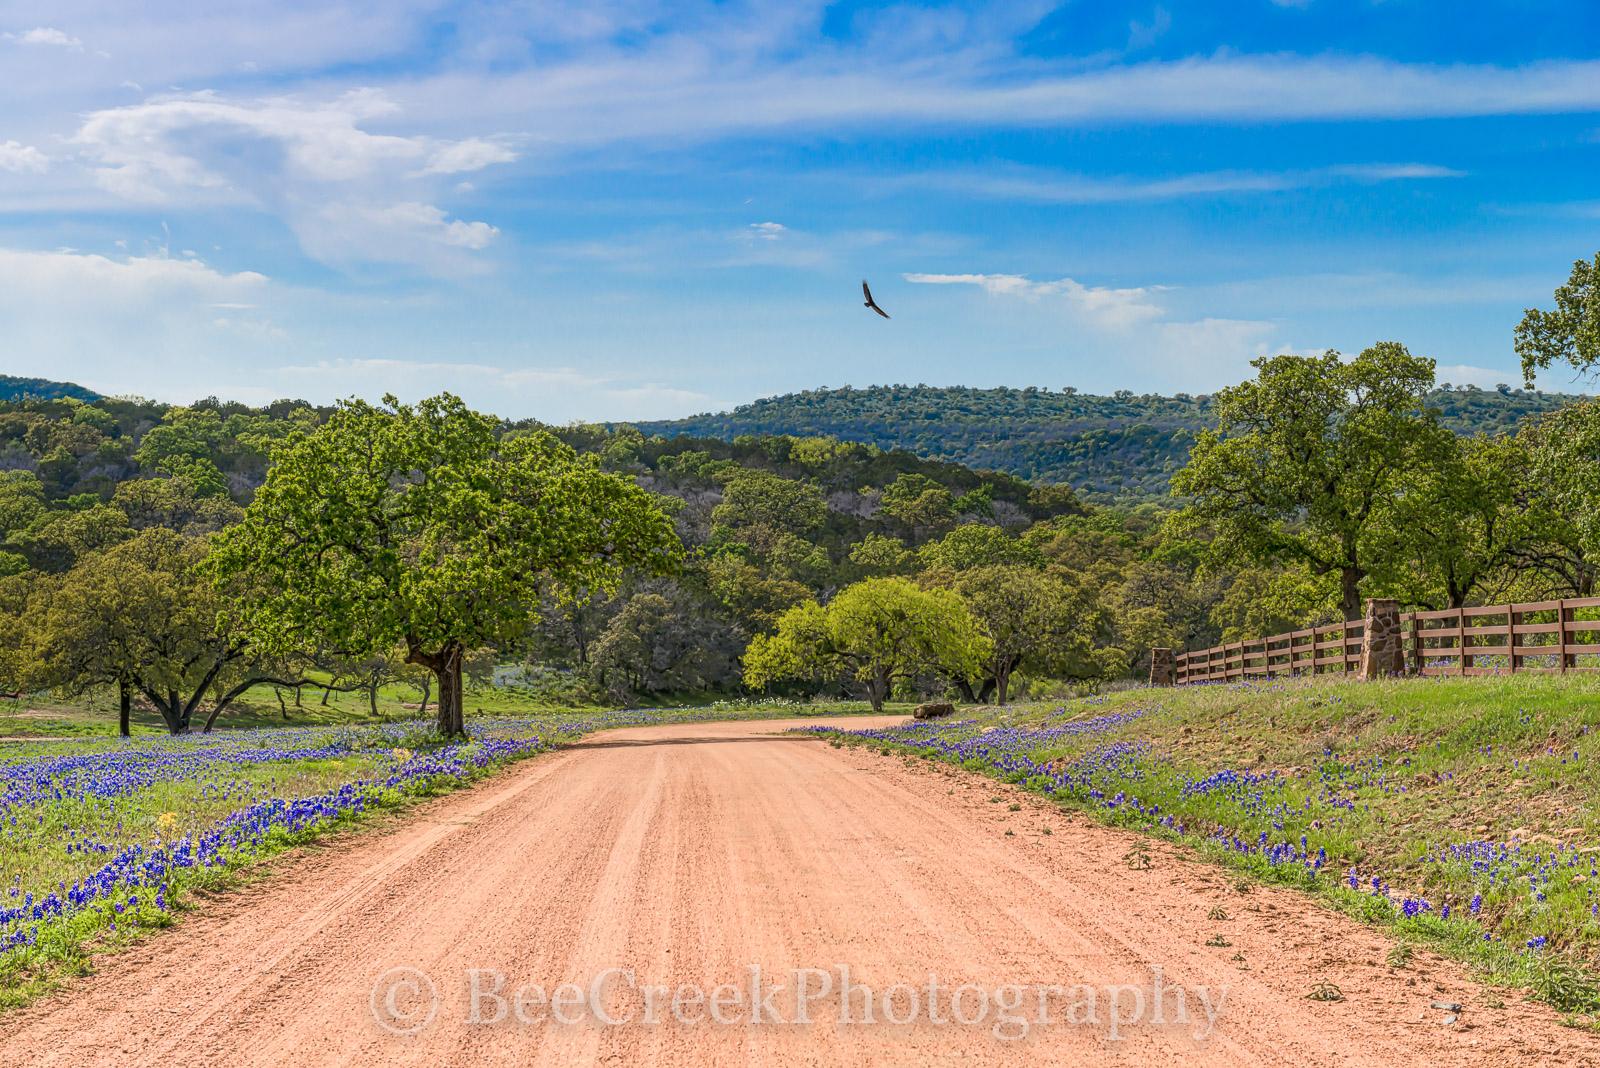 bluebonnets, Texas Hill Country, blue bonnets, dirt road, hills, fence, trees, blue sky, Texas flowers, texas wildflowers, landscape, landscapes, bird, texas wildflowers, springtine, spring, spring fl, photo